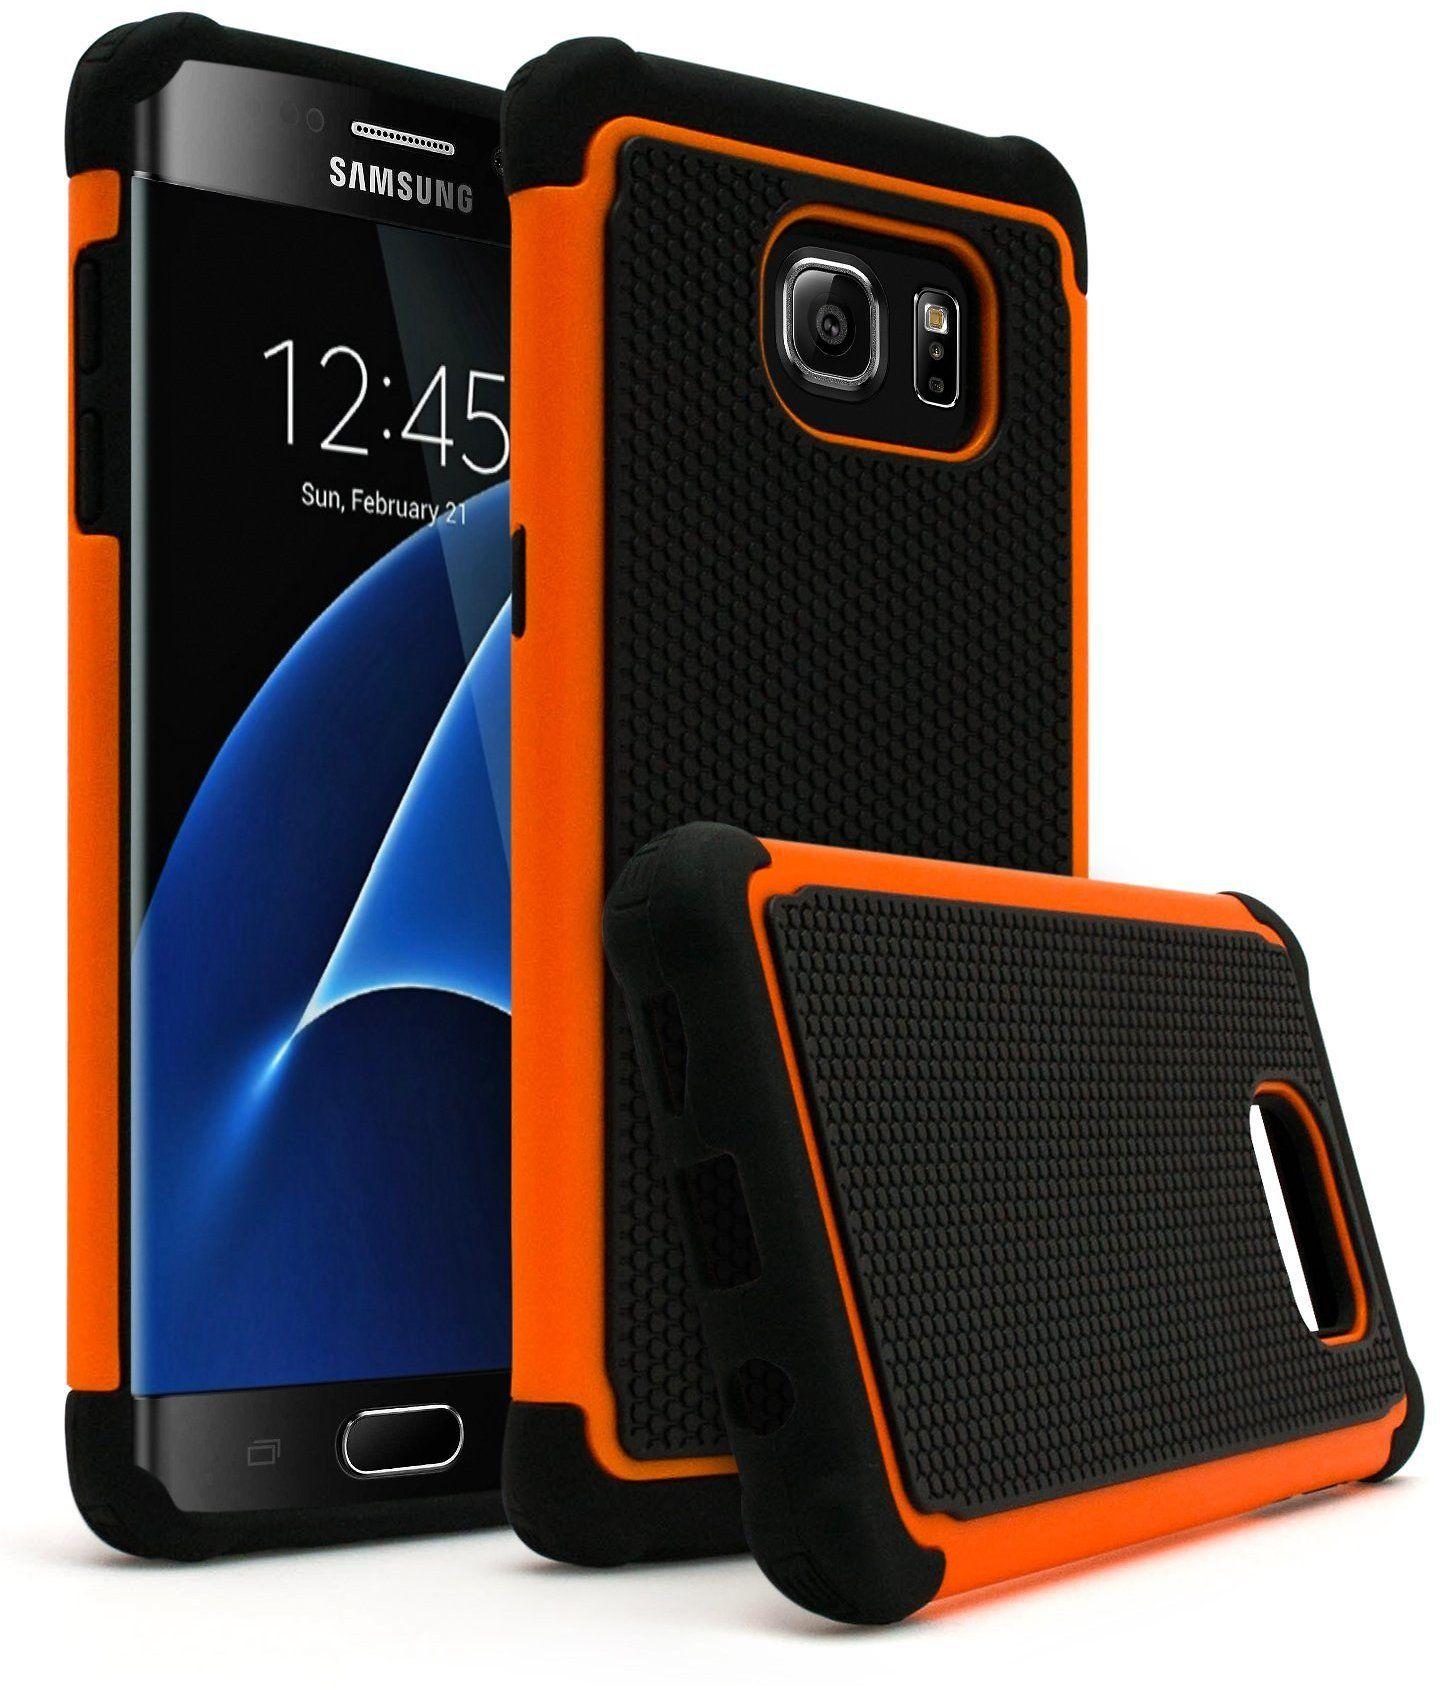 Today's Best Samsung Deals